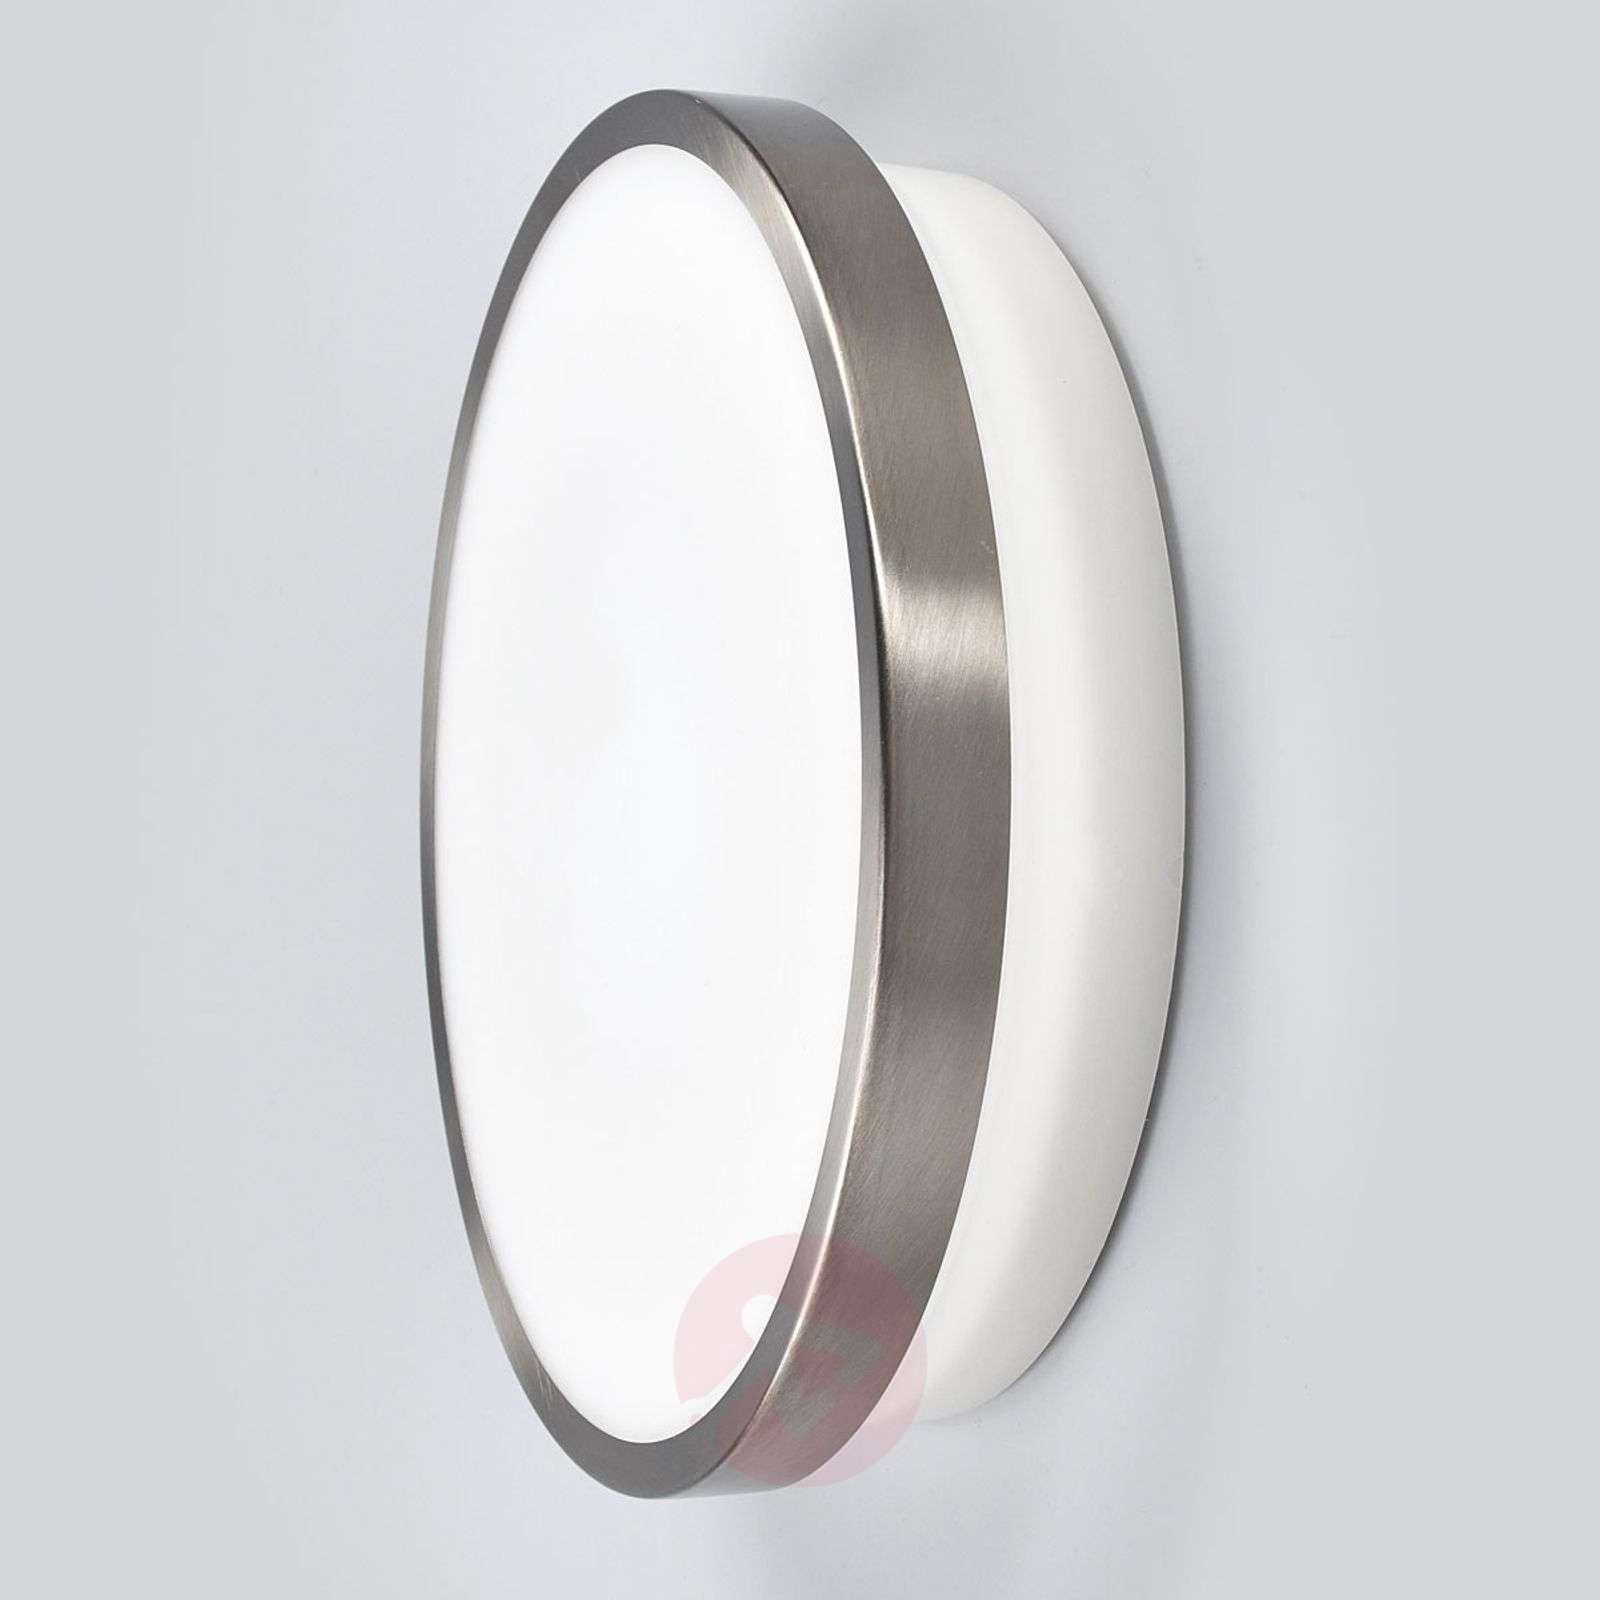 Led Outdoor Wall Lamp Noxlite Circular With Sensor